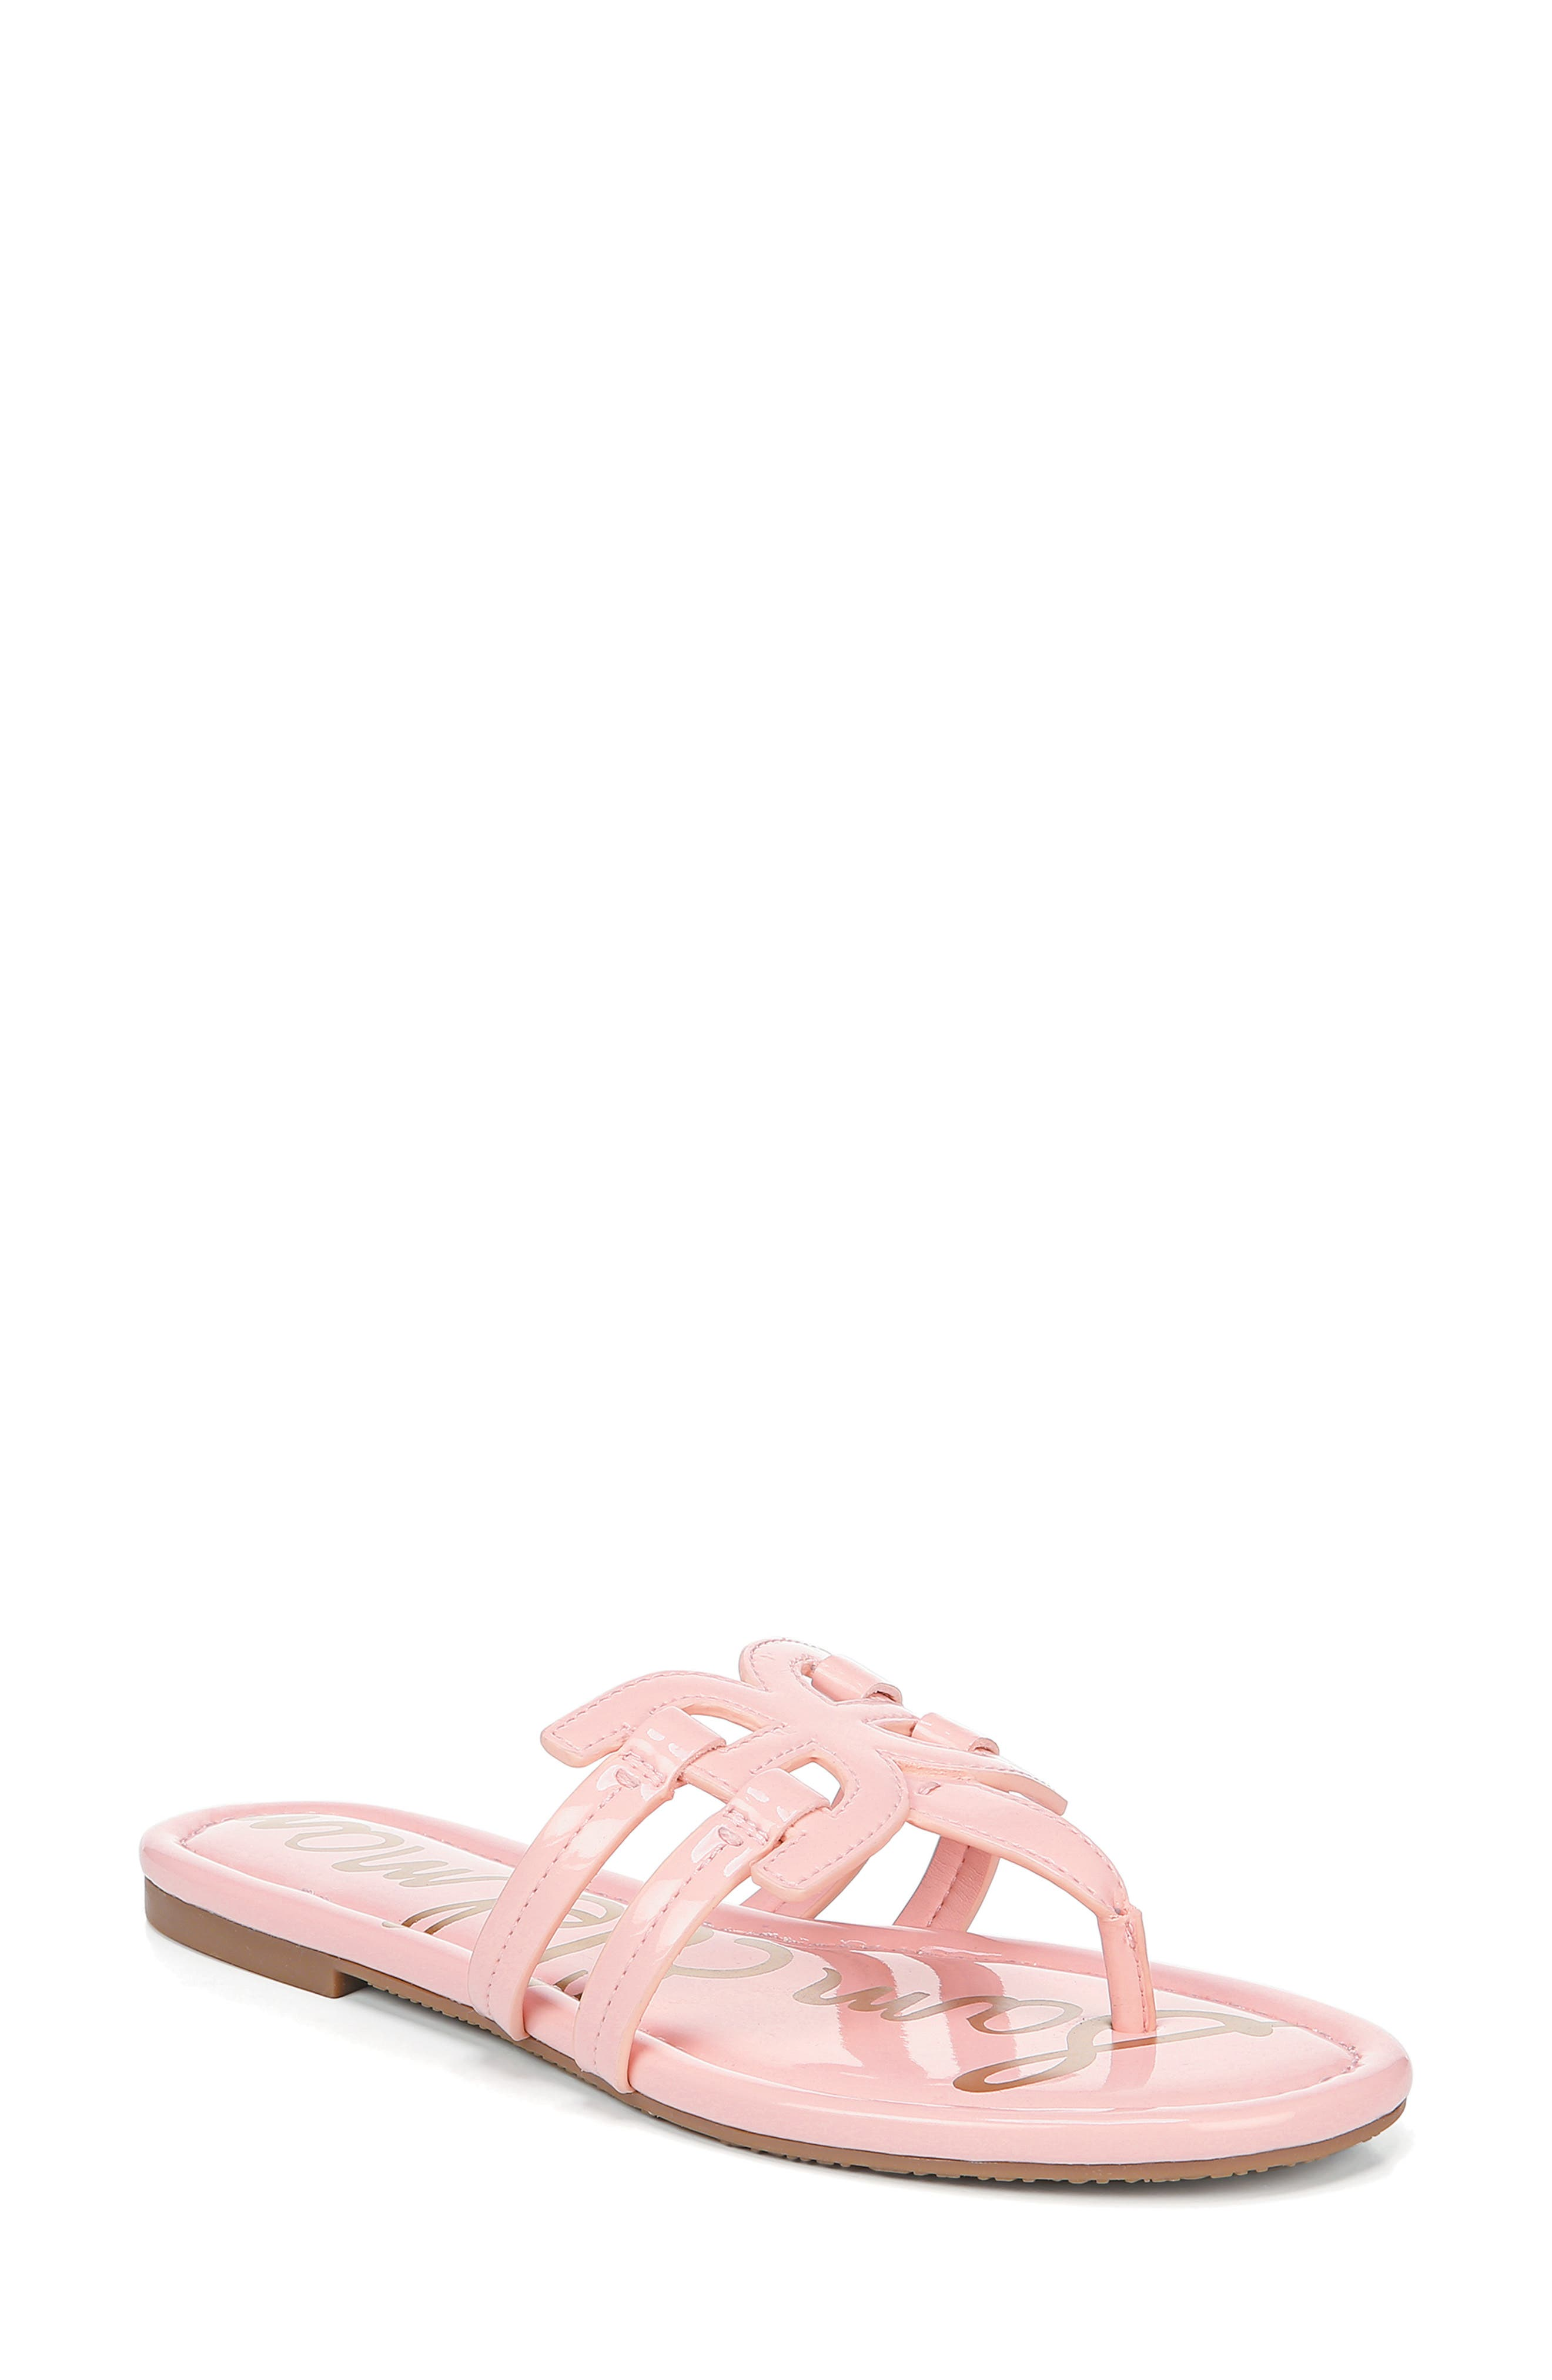 ef320d1df7b Sam Edelman Flip-Flops   Sandals for Women